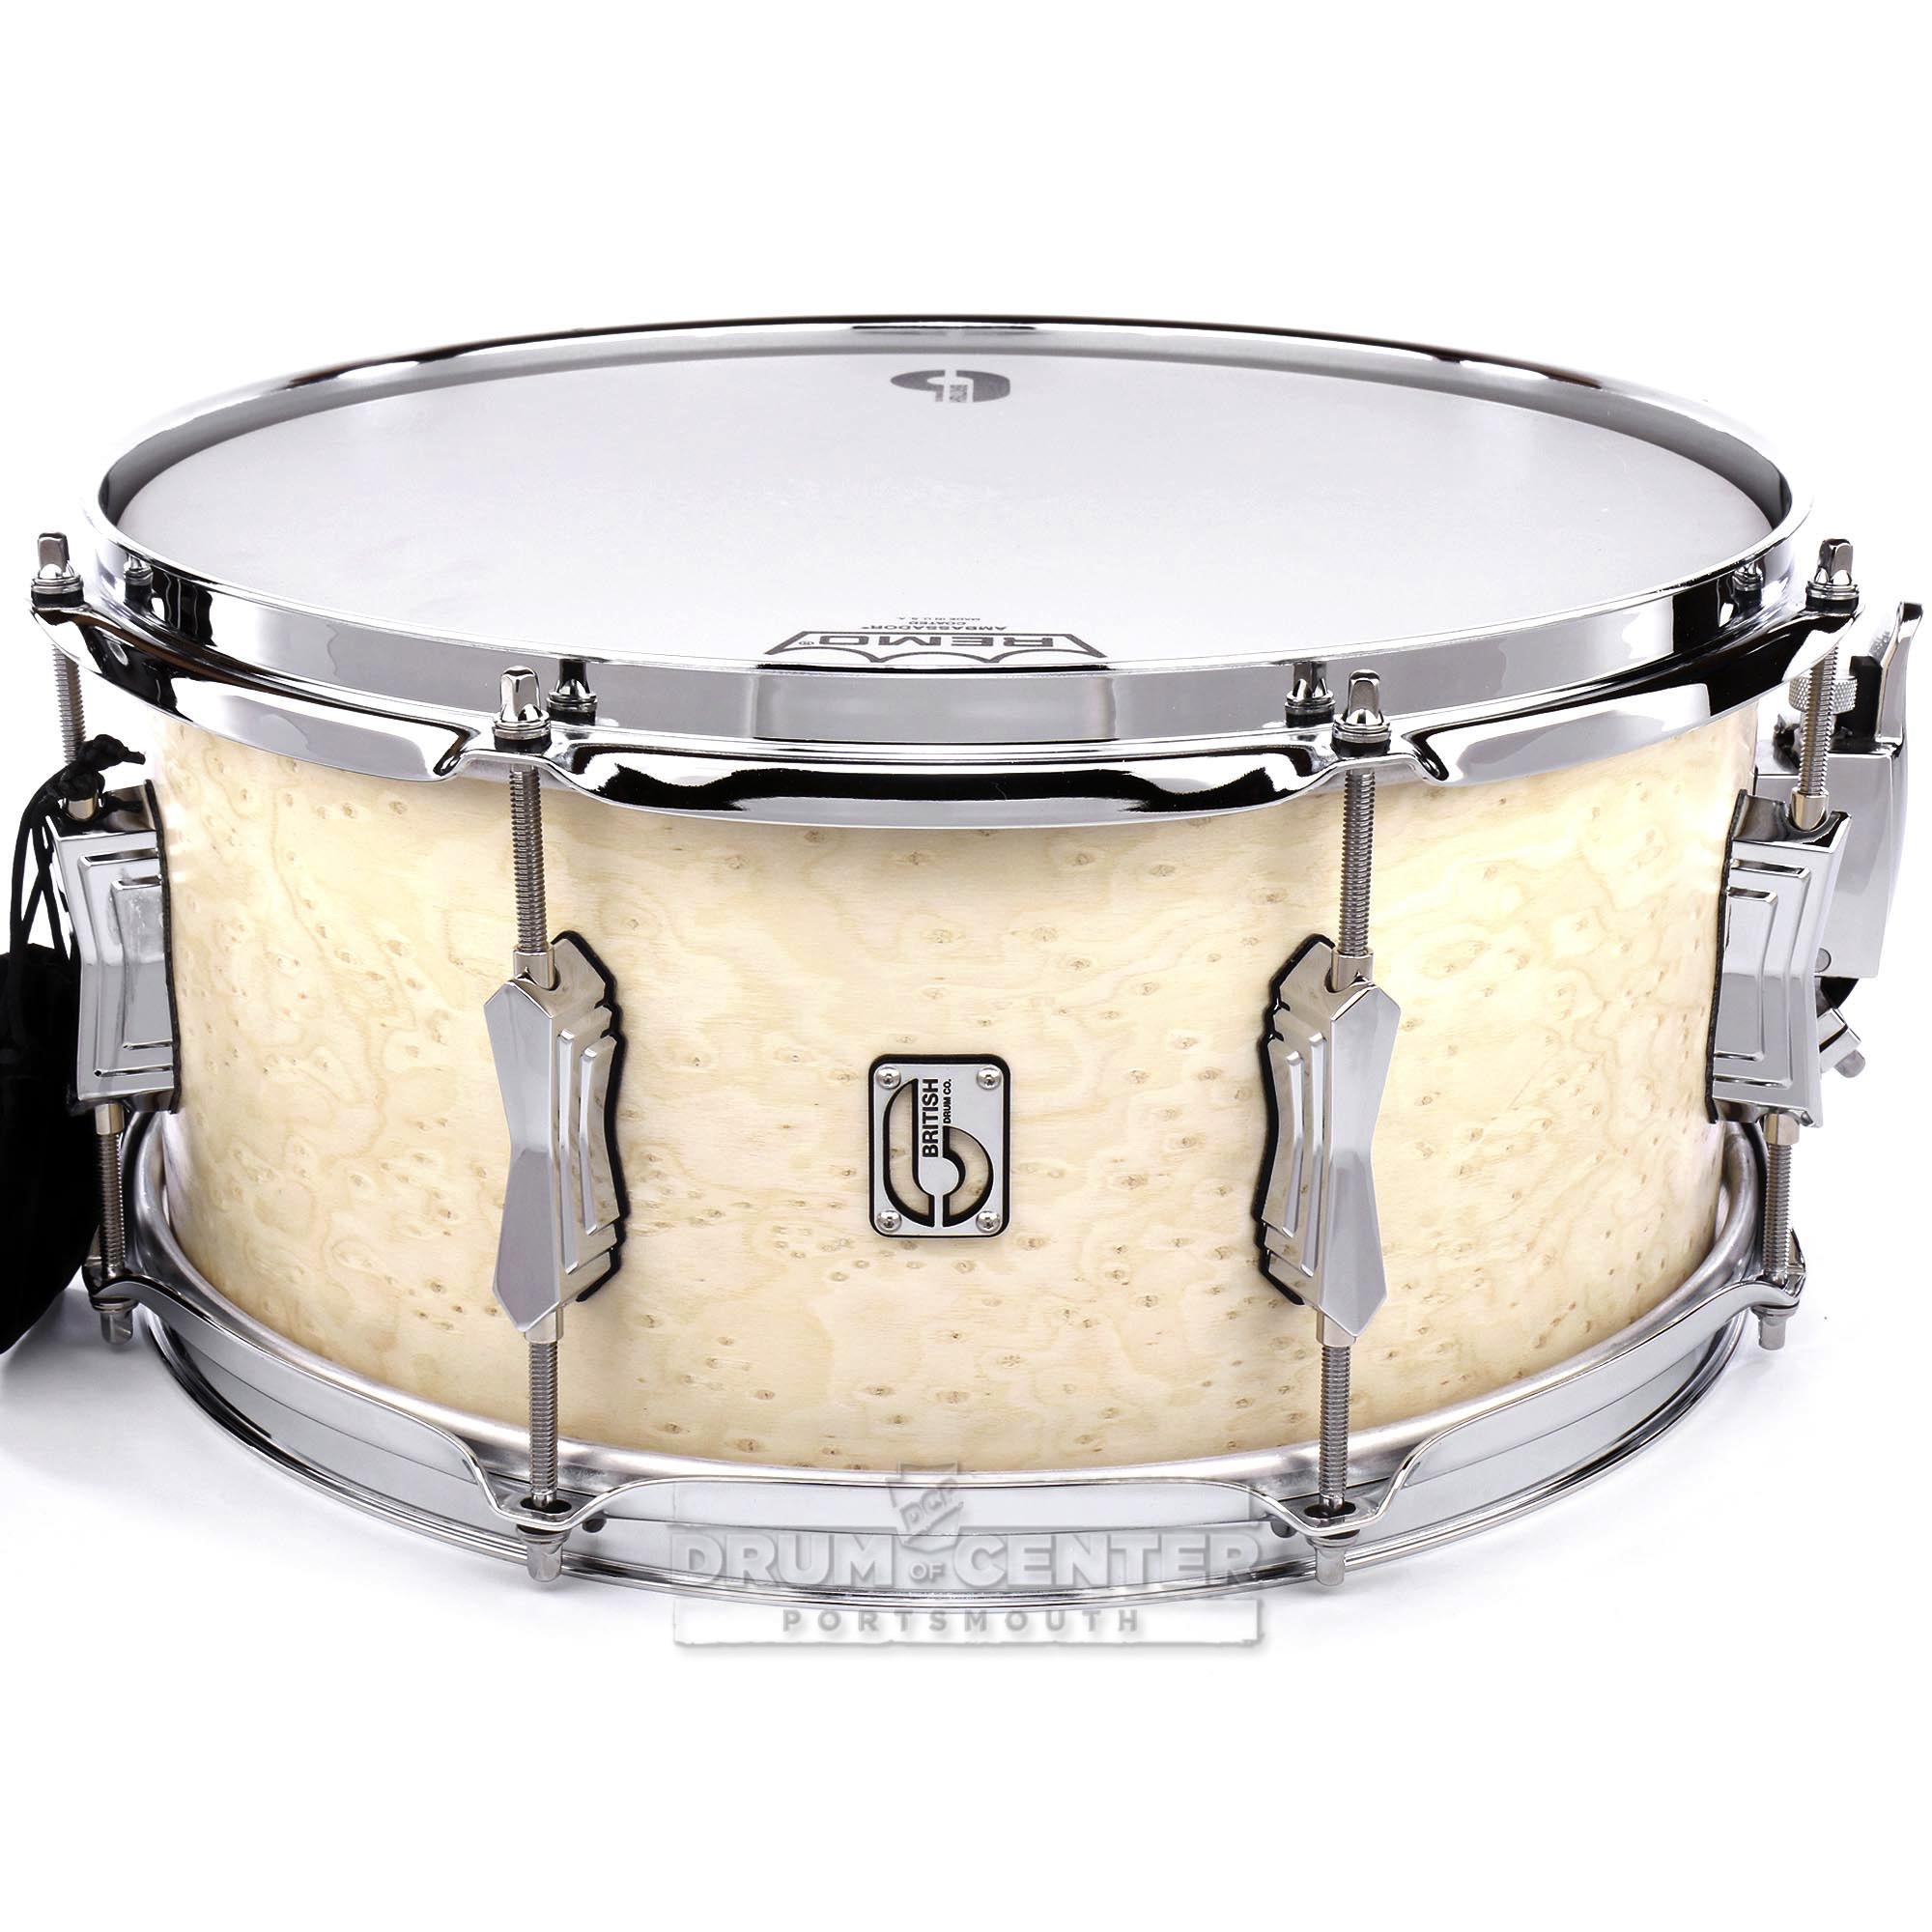 british drum company lounge series snare drum wiltshire white 14x6 5 882030238604 ebay. Black Bedroom Furniture Sets. Home Design Ideas